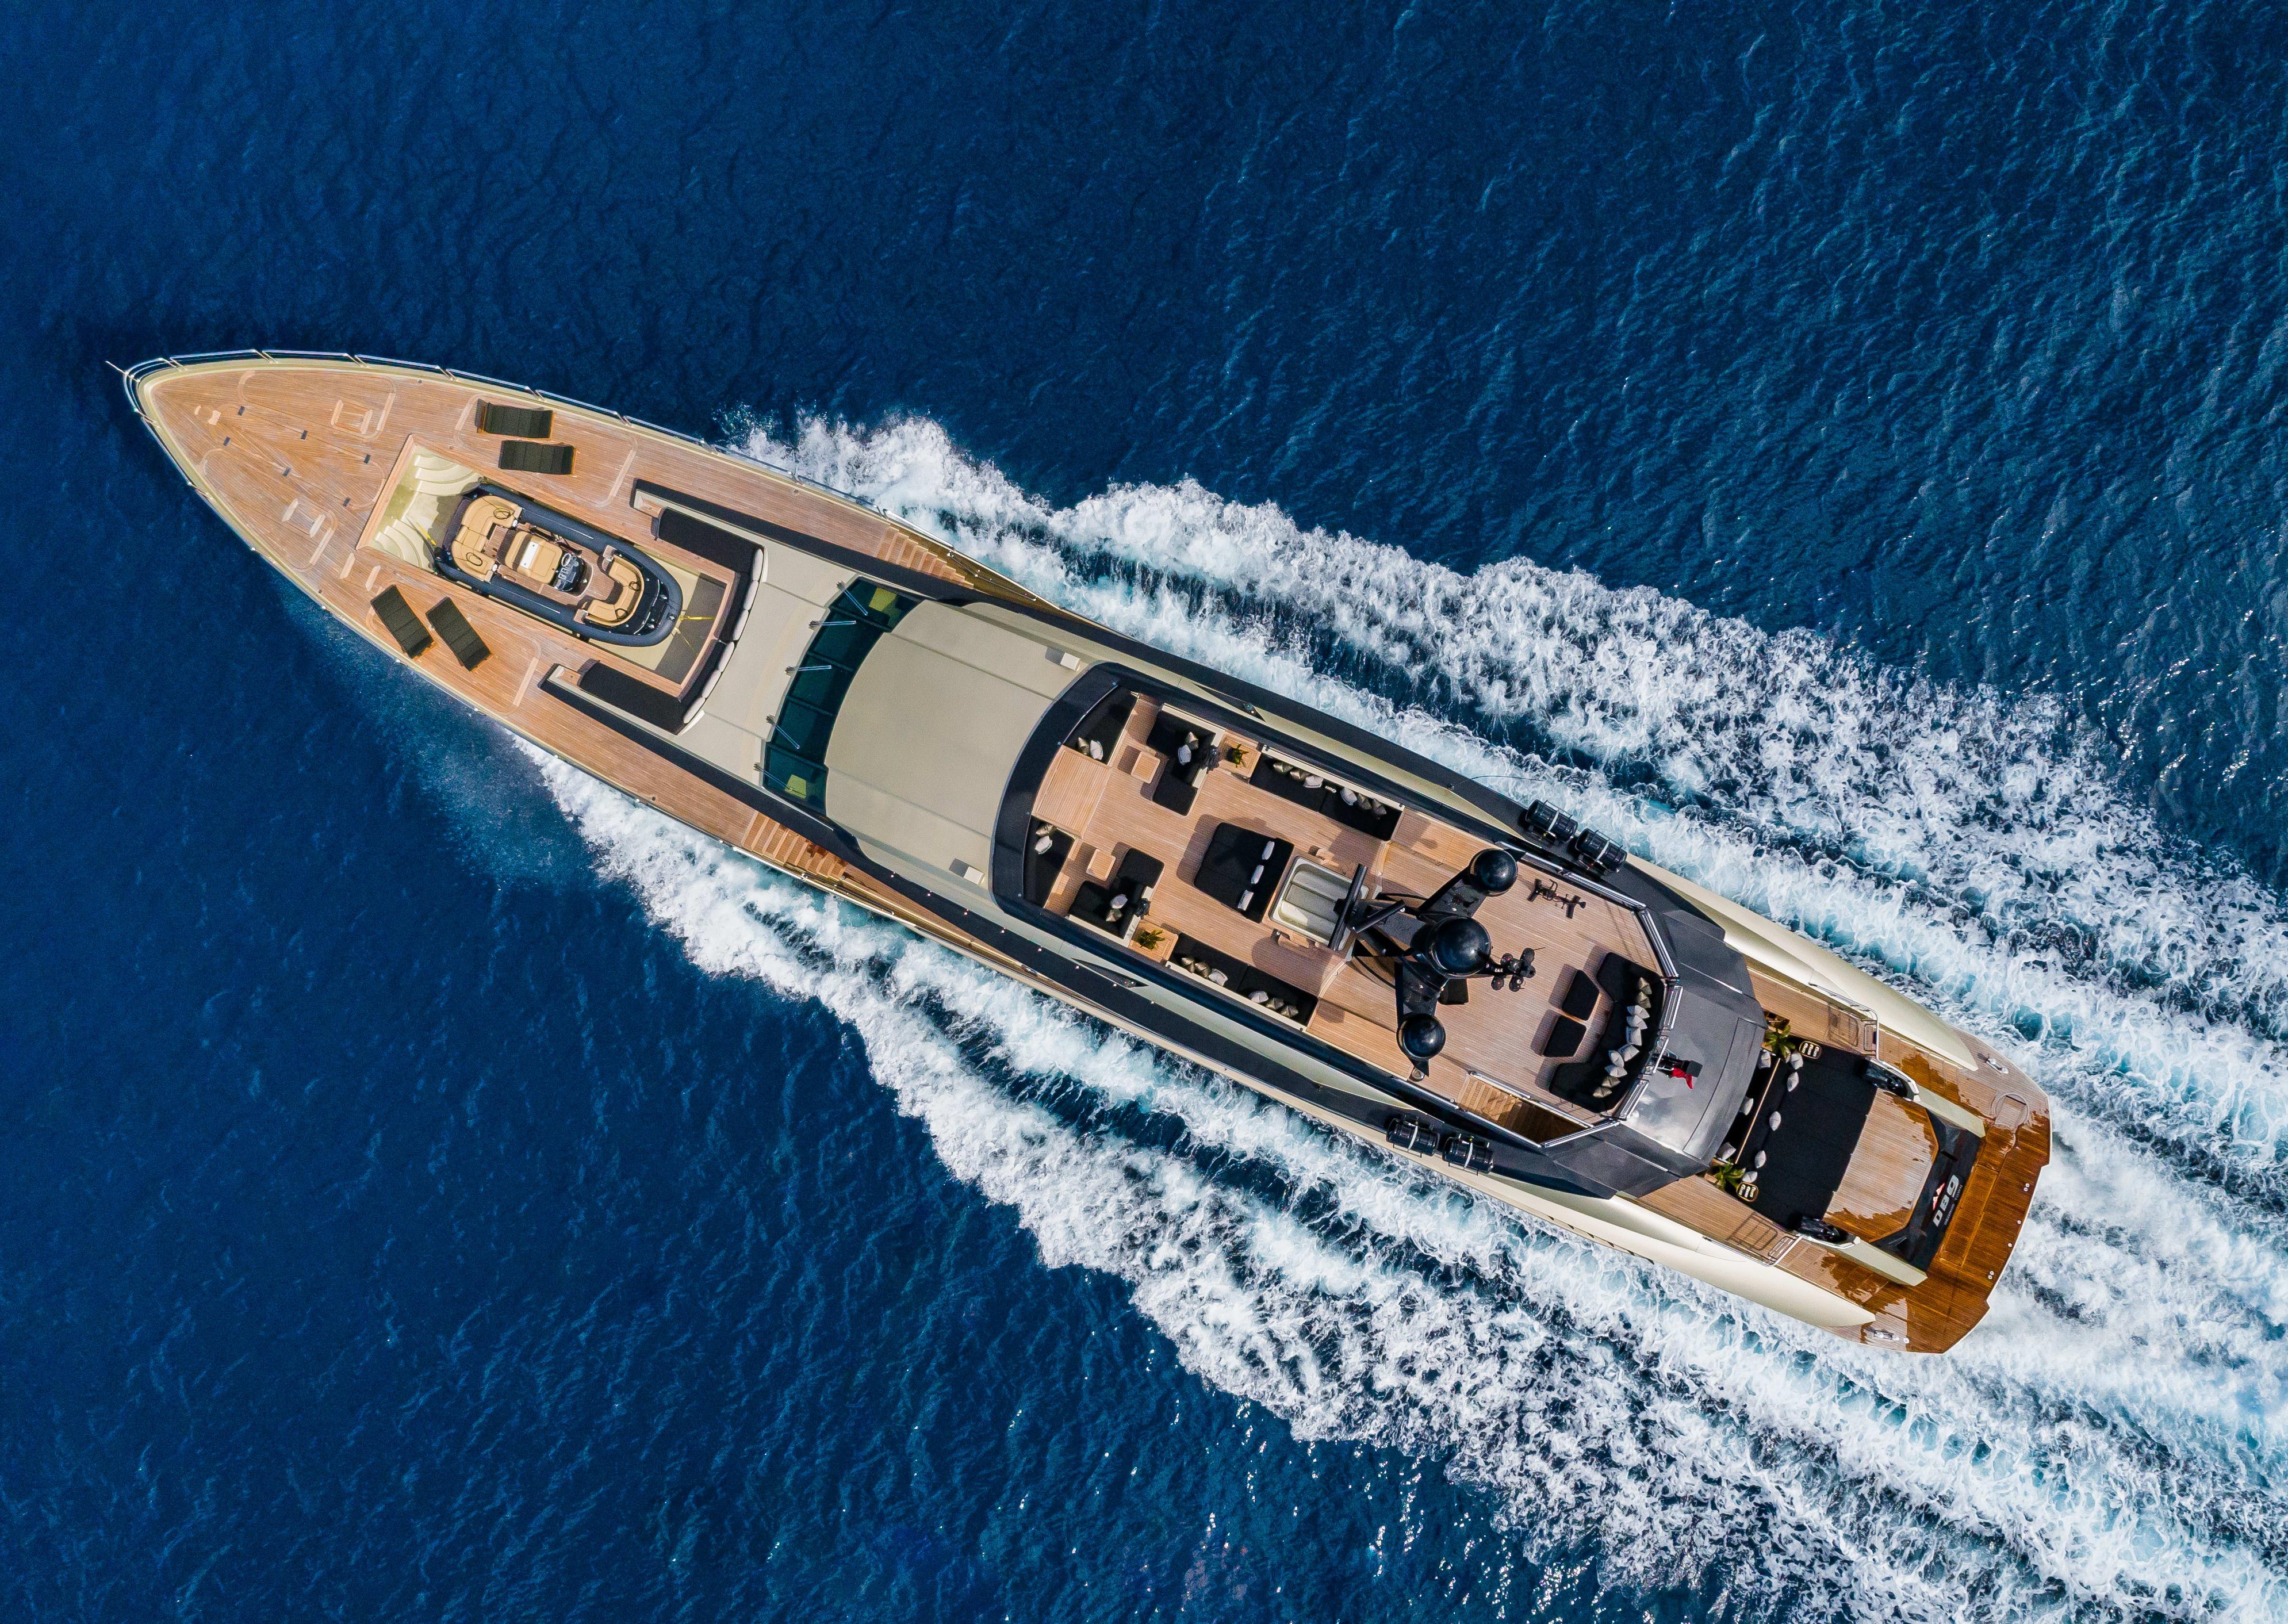 Image of DB9 52.3M (171.9FT) motor yacht